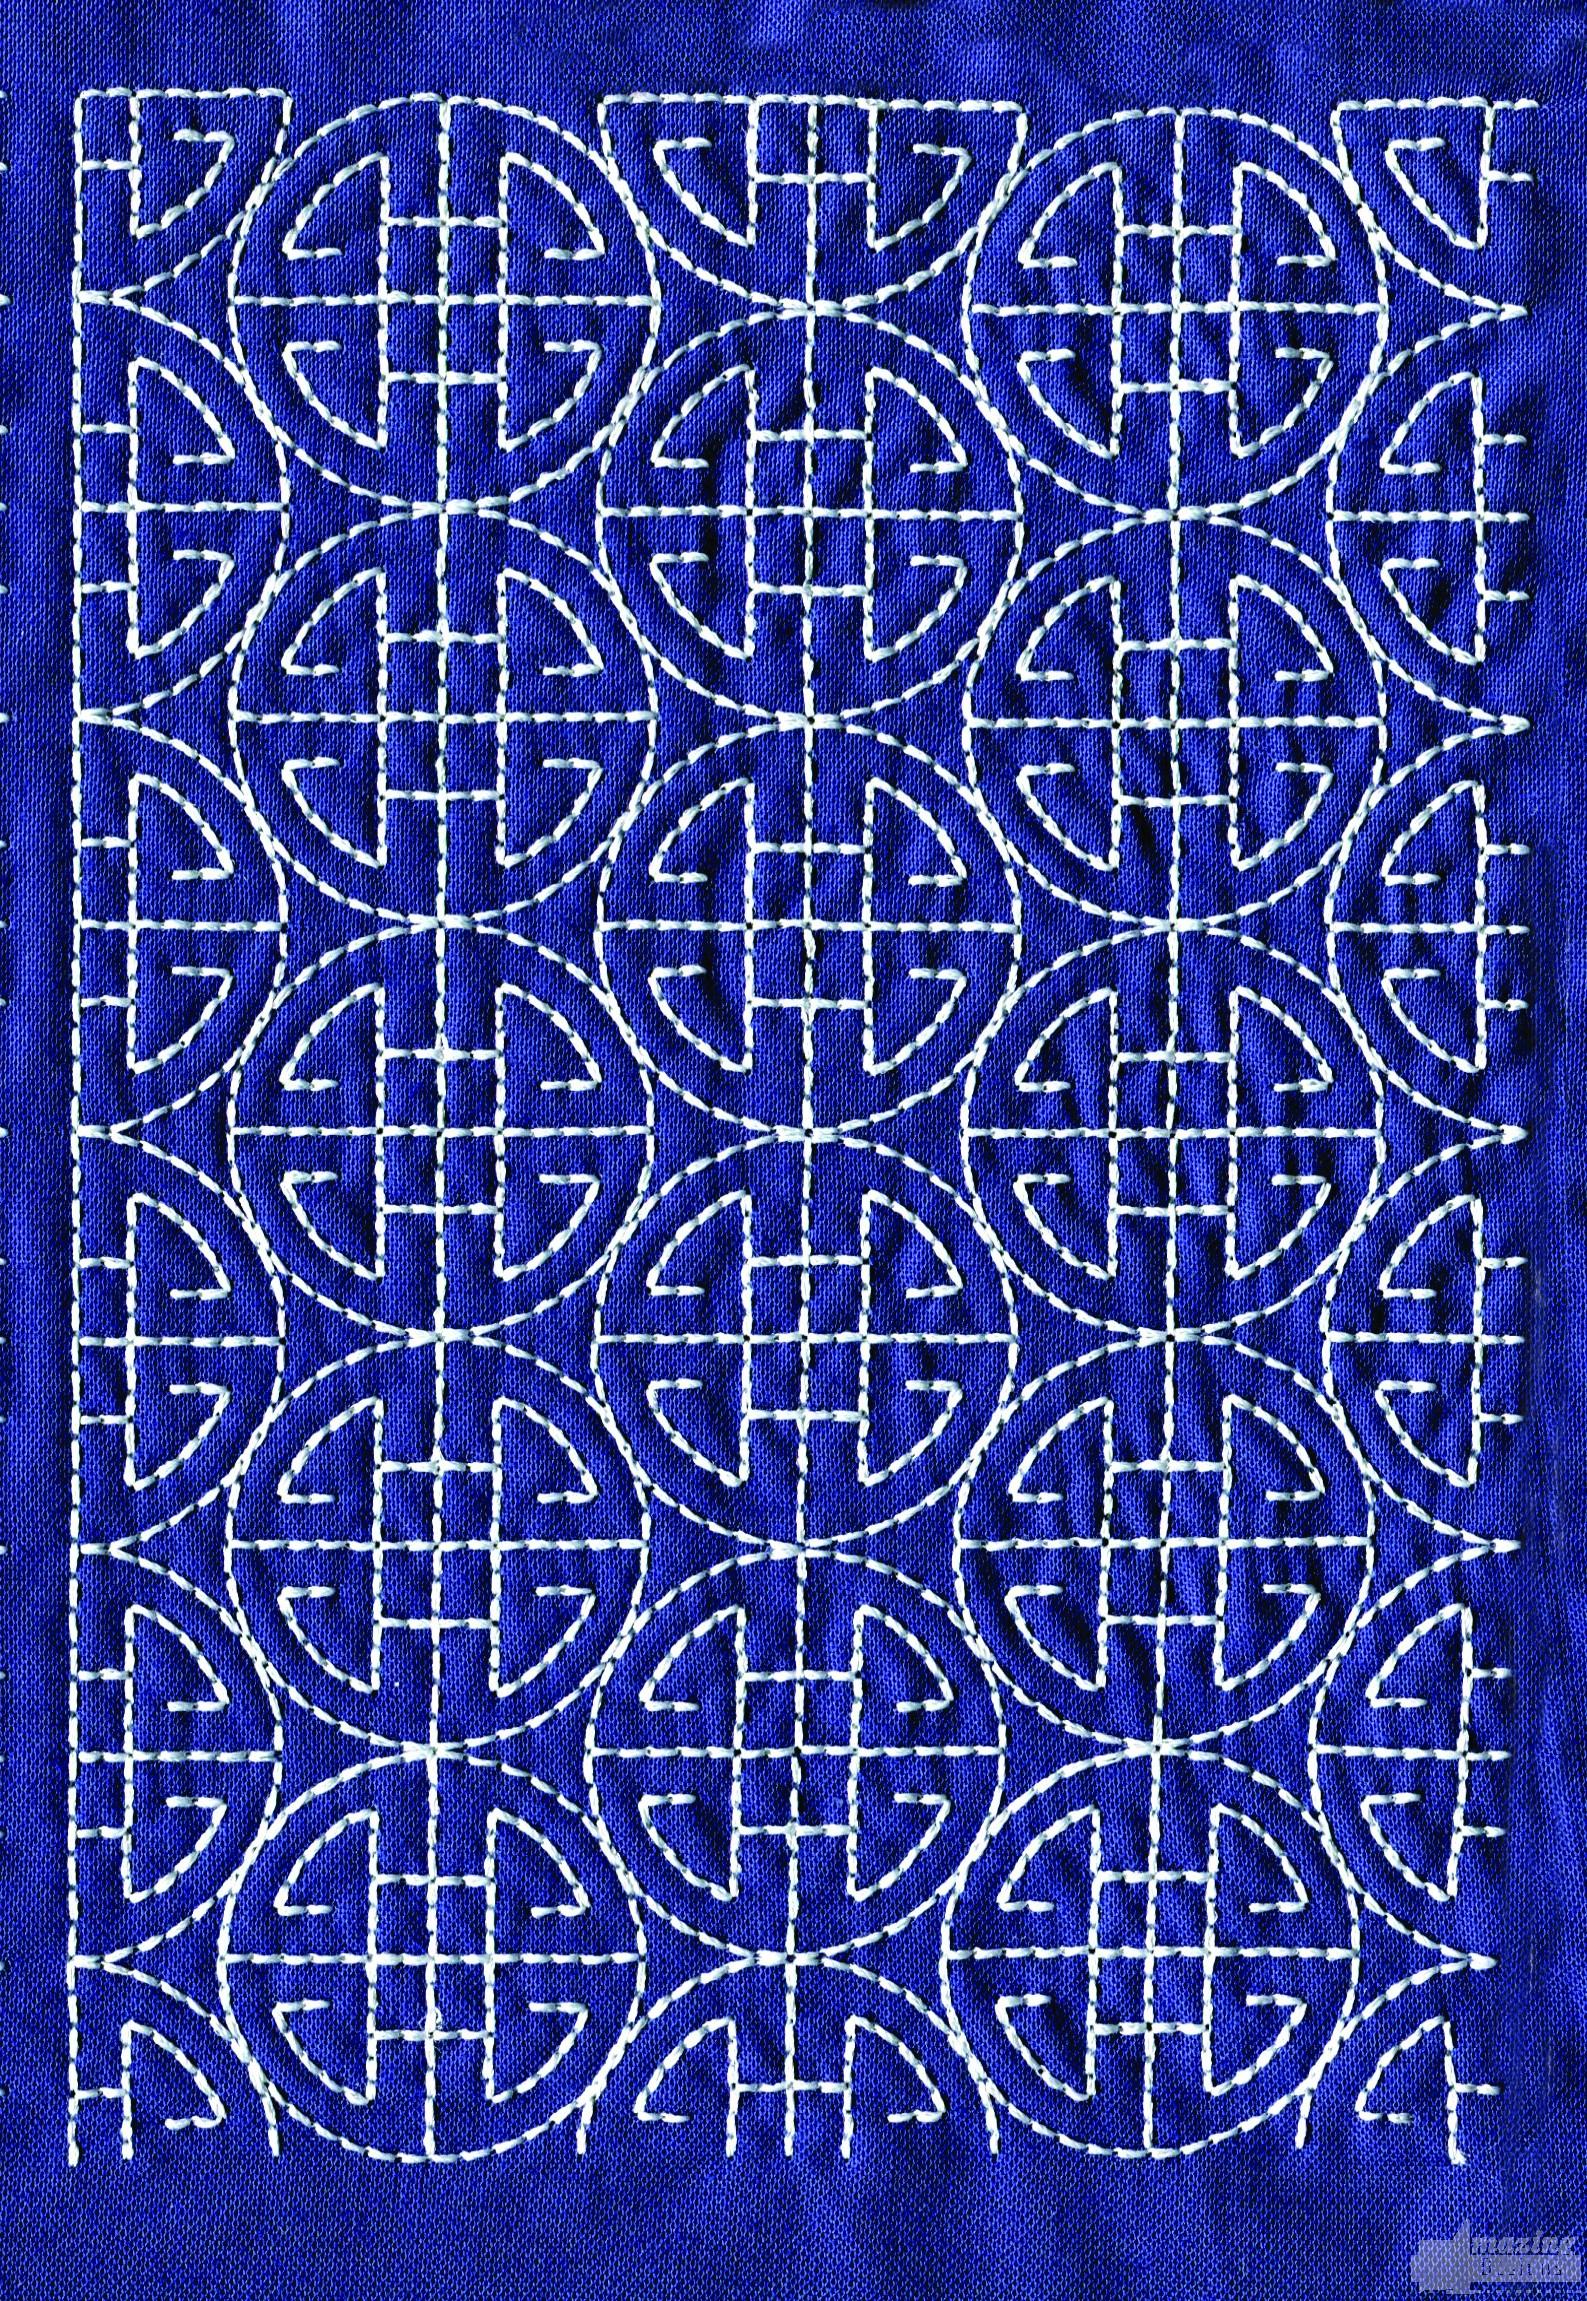 Sashiko Quilting Patterns Free : Sashiko Quilt Embroidery Design 5